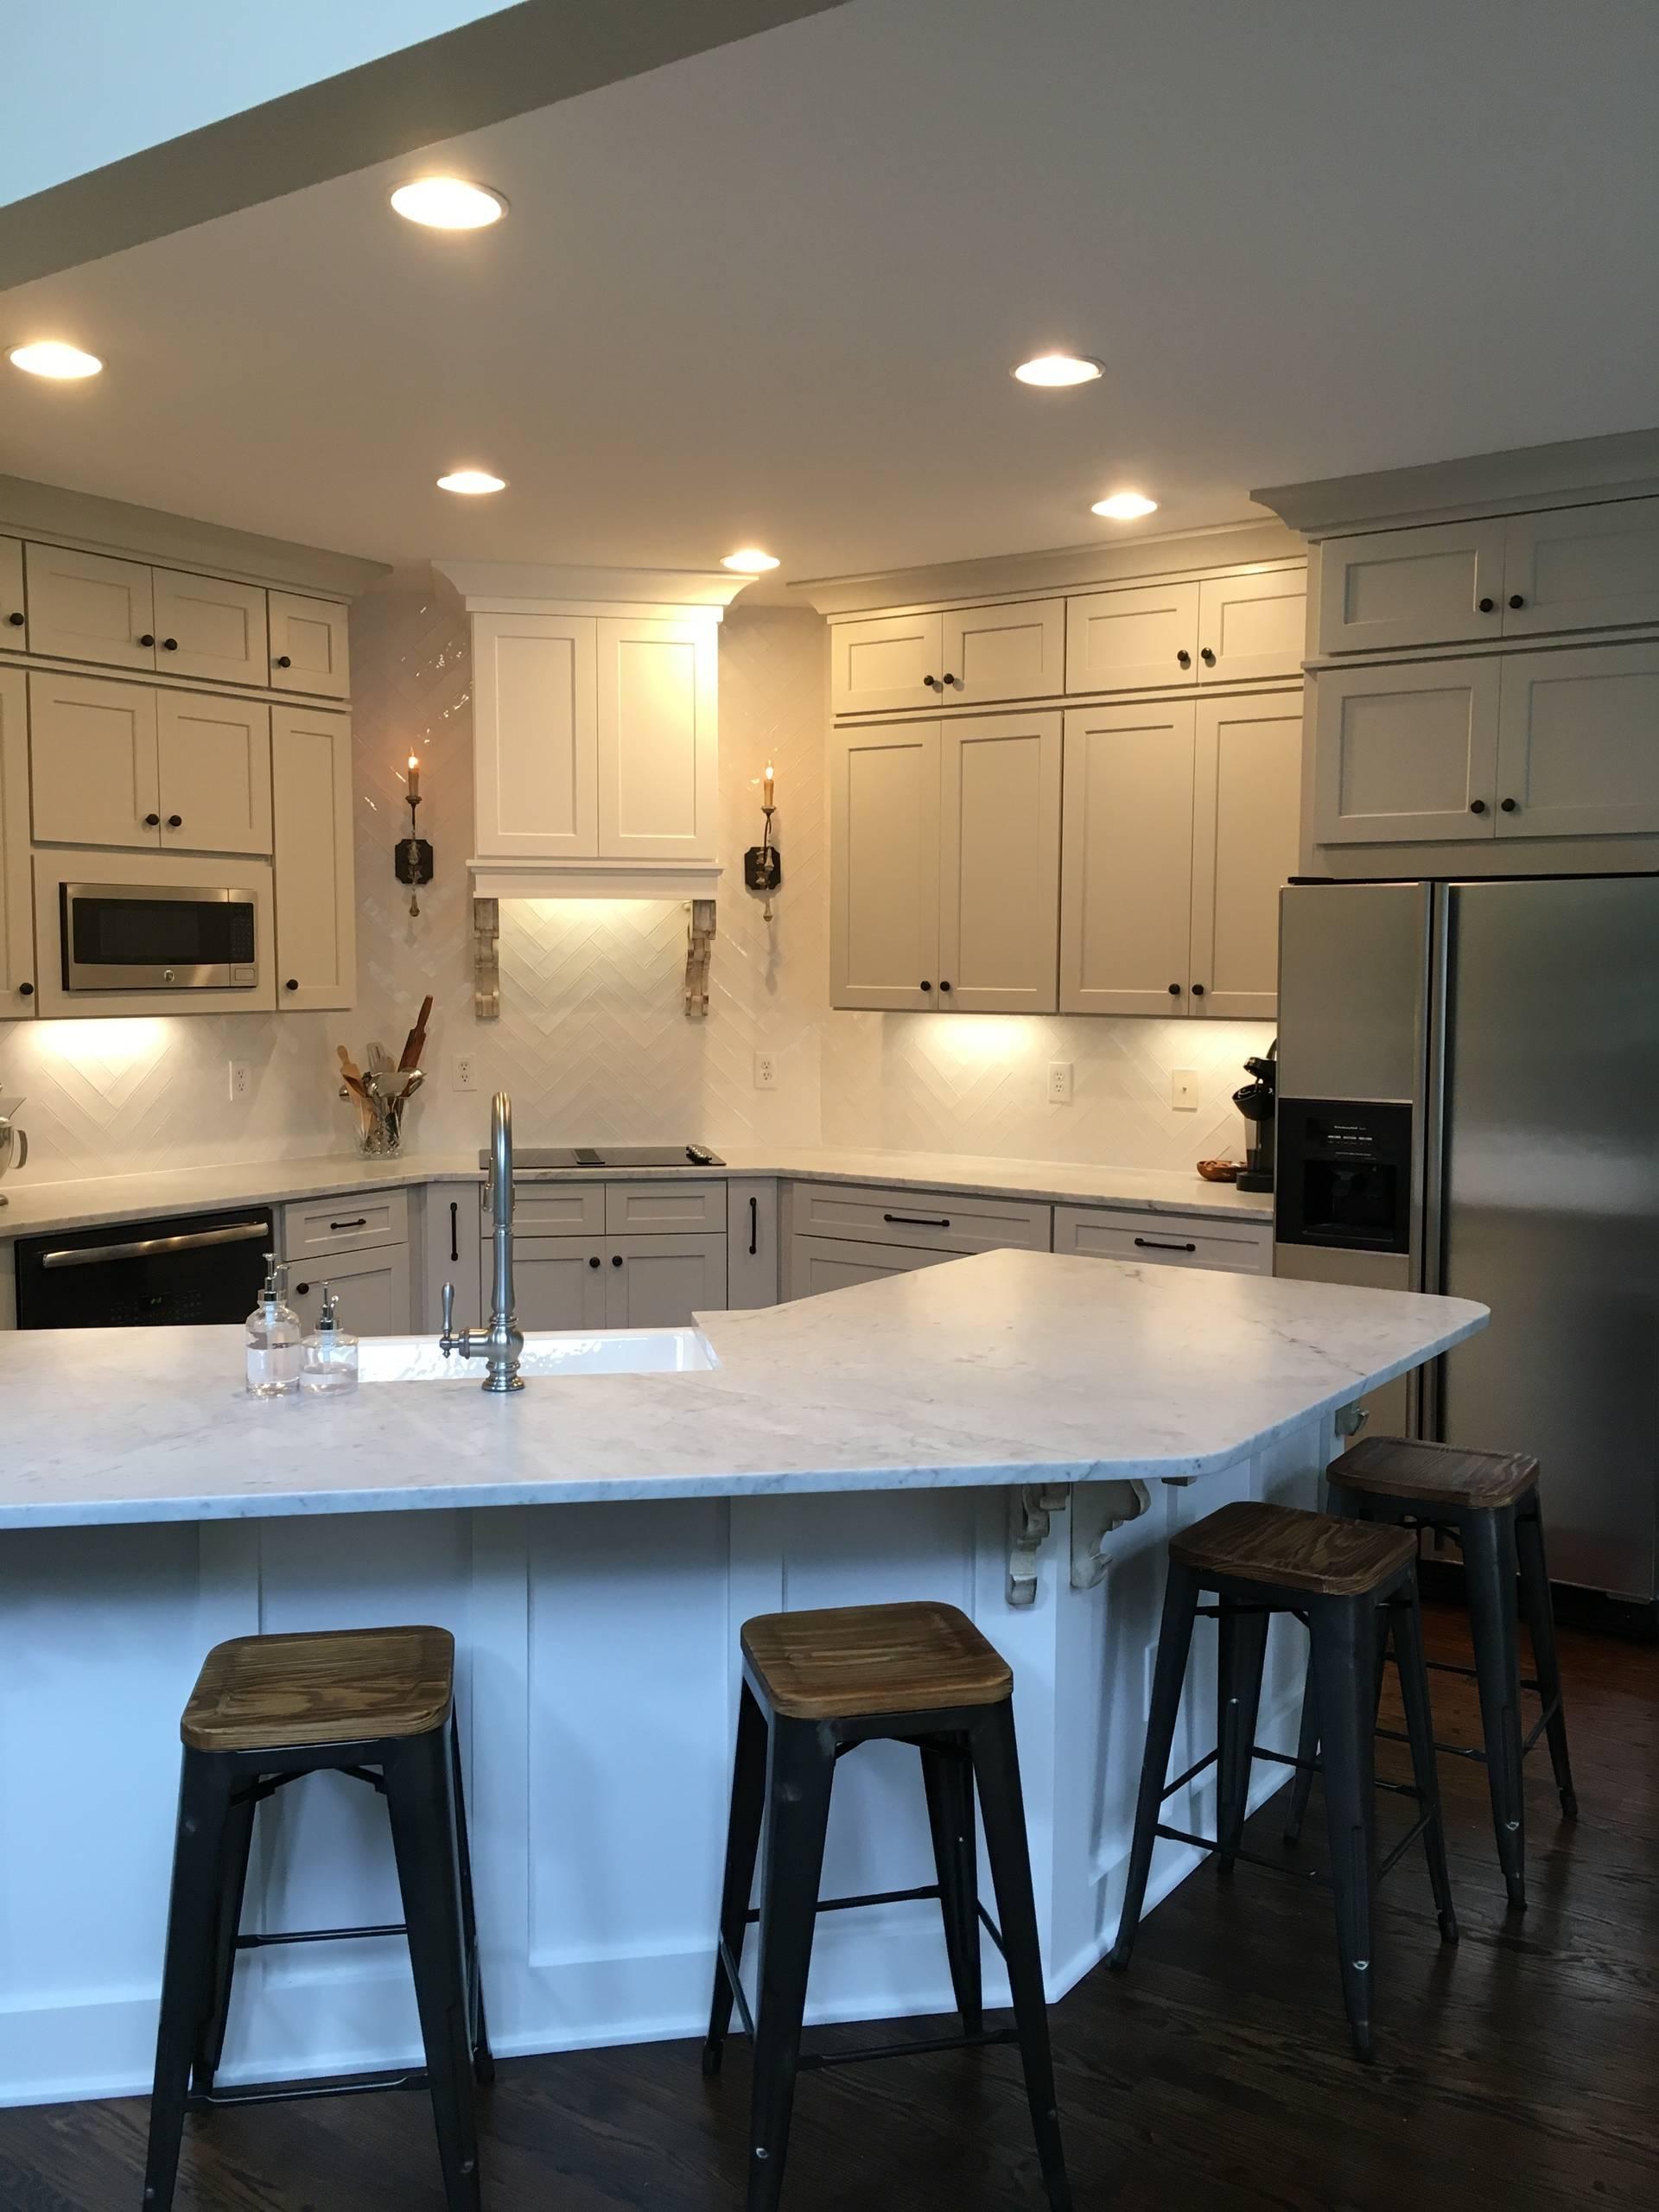 Smyrma Unique Kitchen Remodel